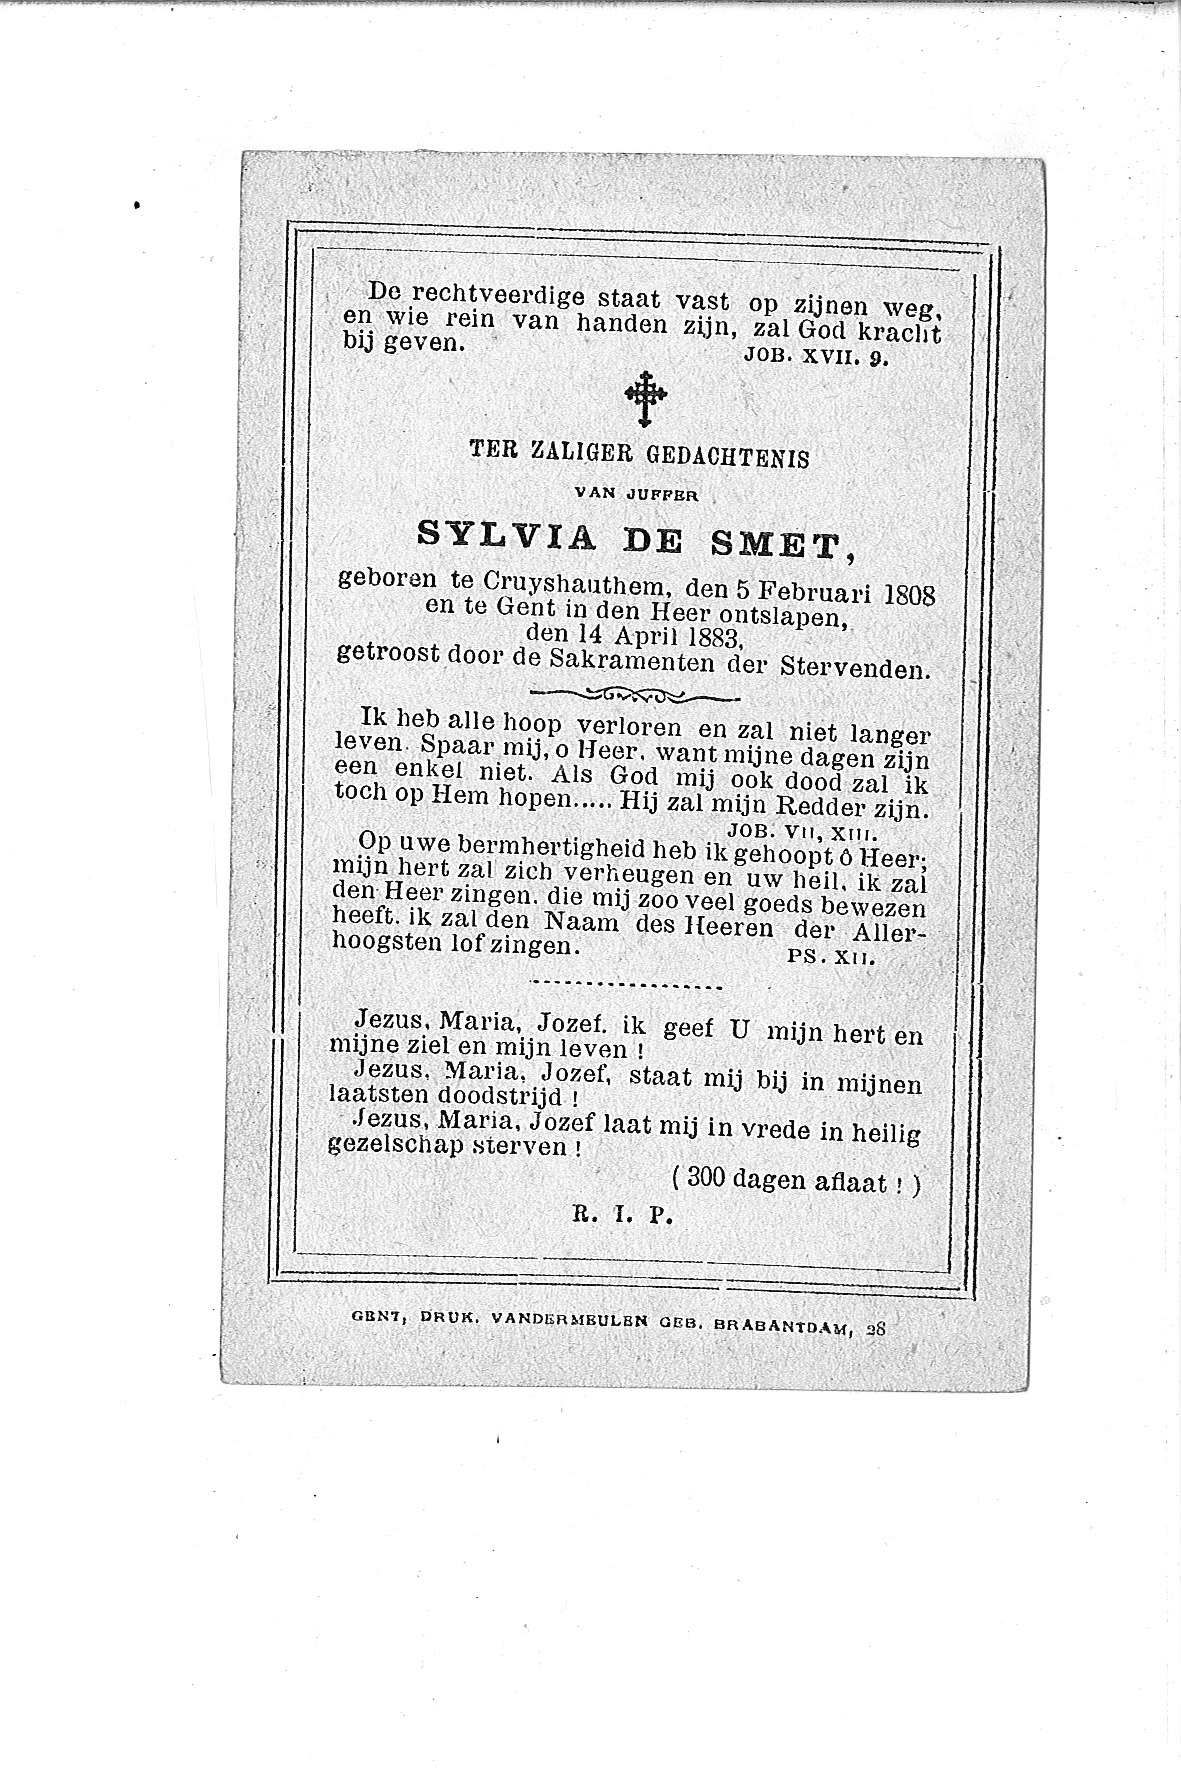 Sylvia (1883) 20120502165716_00211.jpg